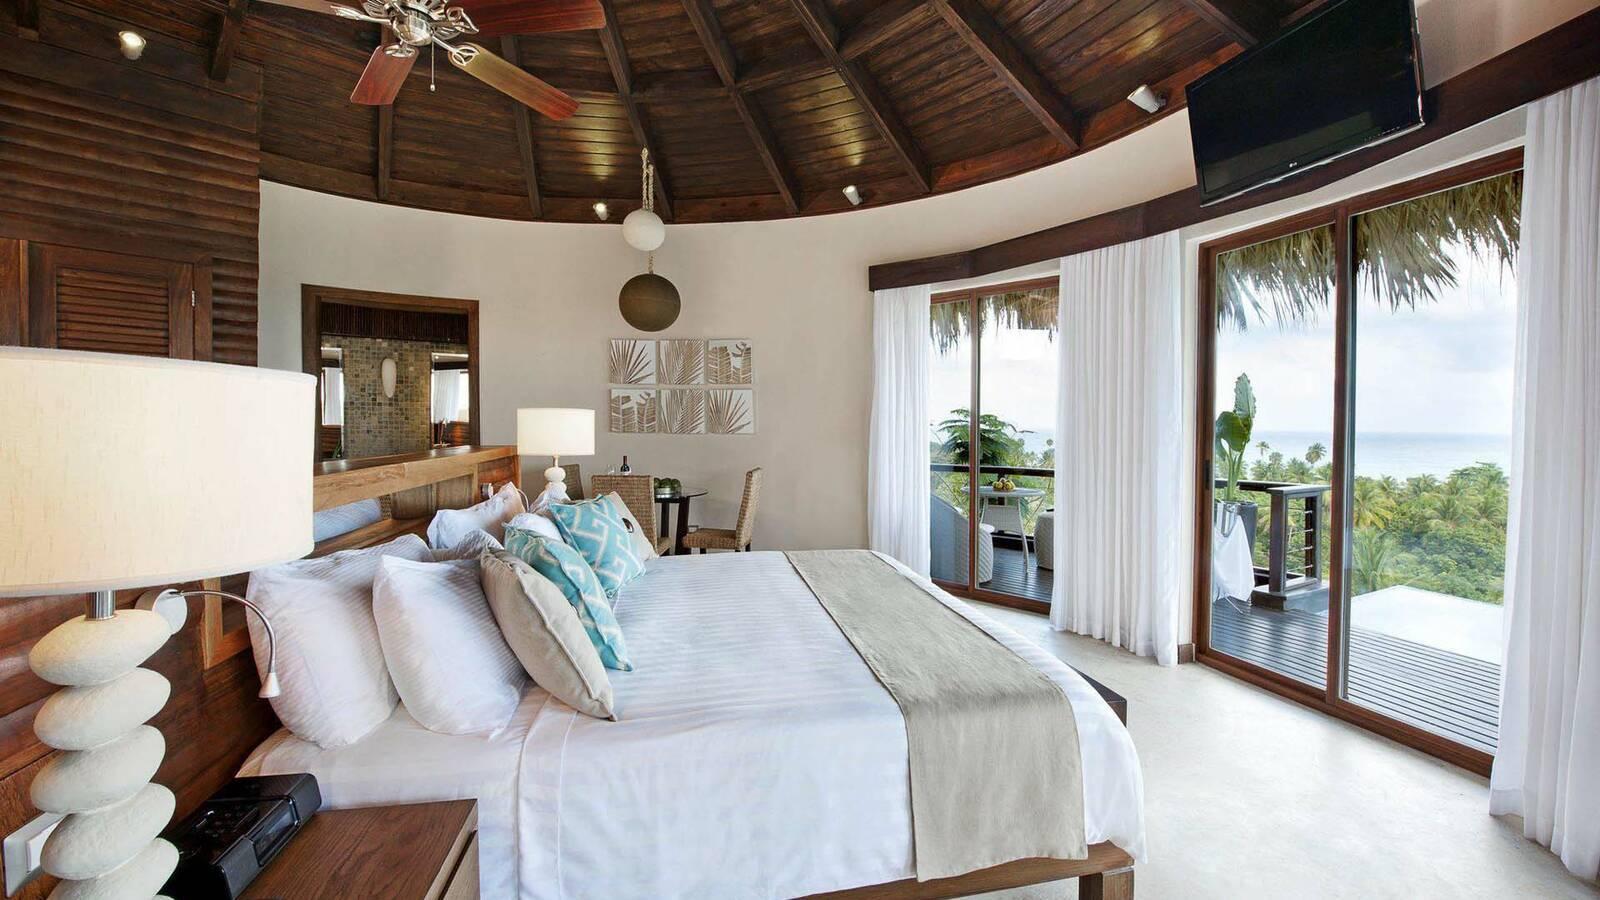 Casa Bonita Tropical Lodge Republique Dominicaine Ocean View Suite